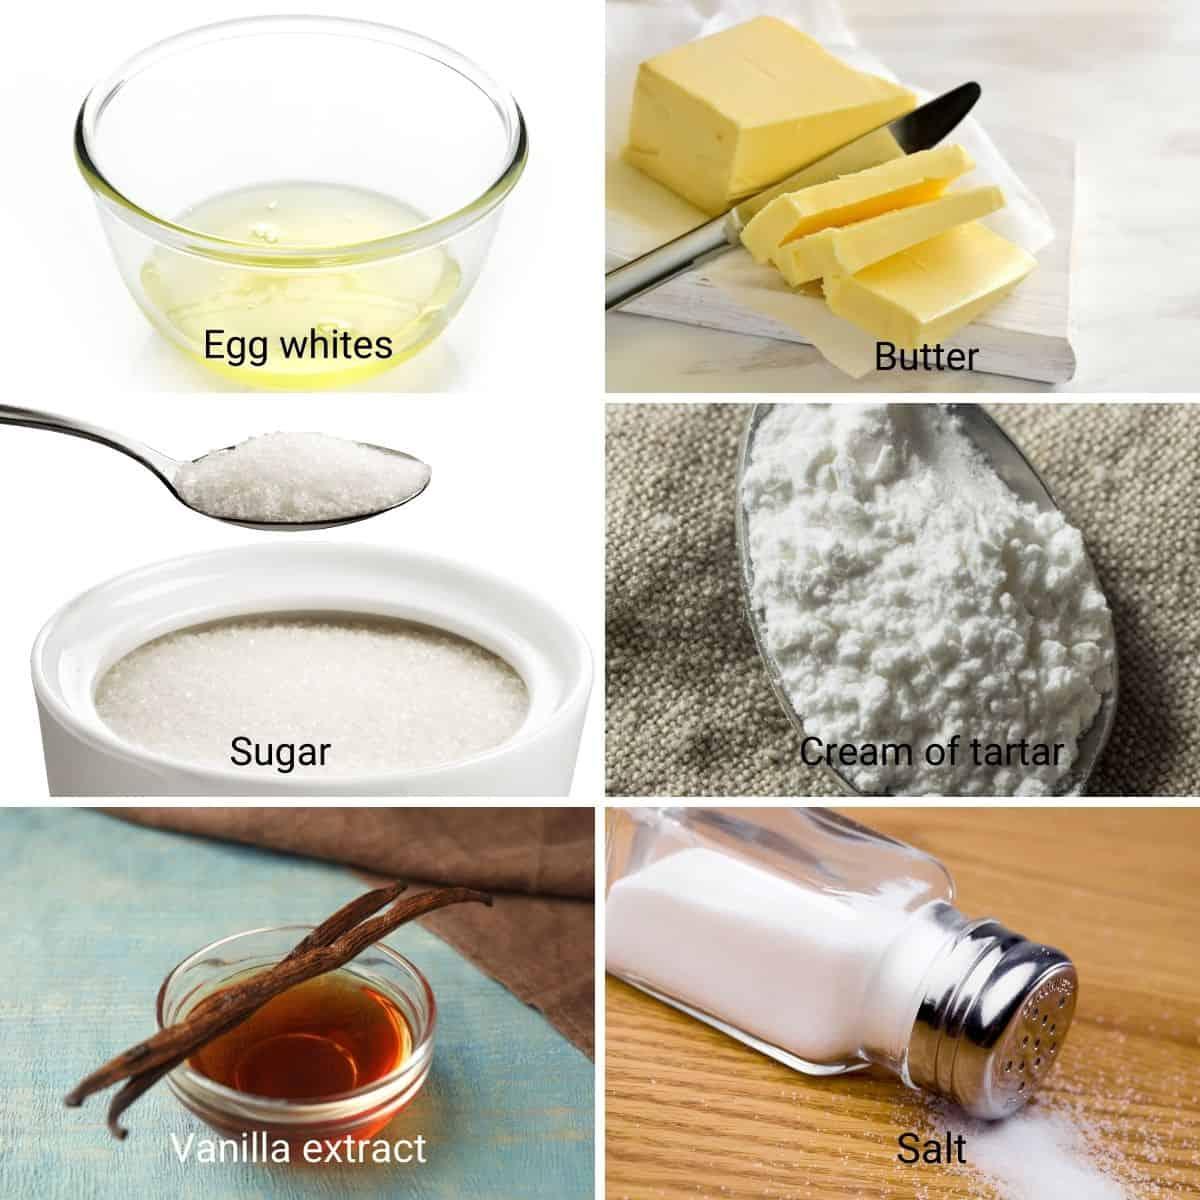 Ingredients for Italian Meringue Buttercream.